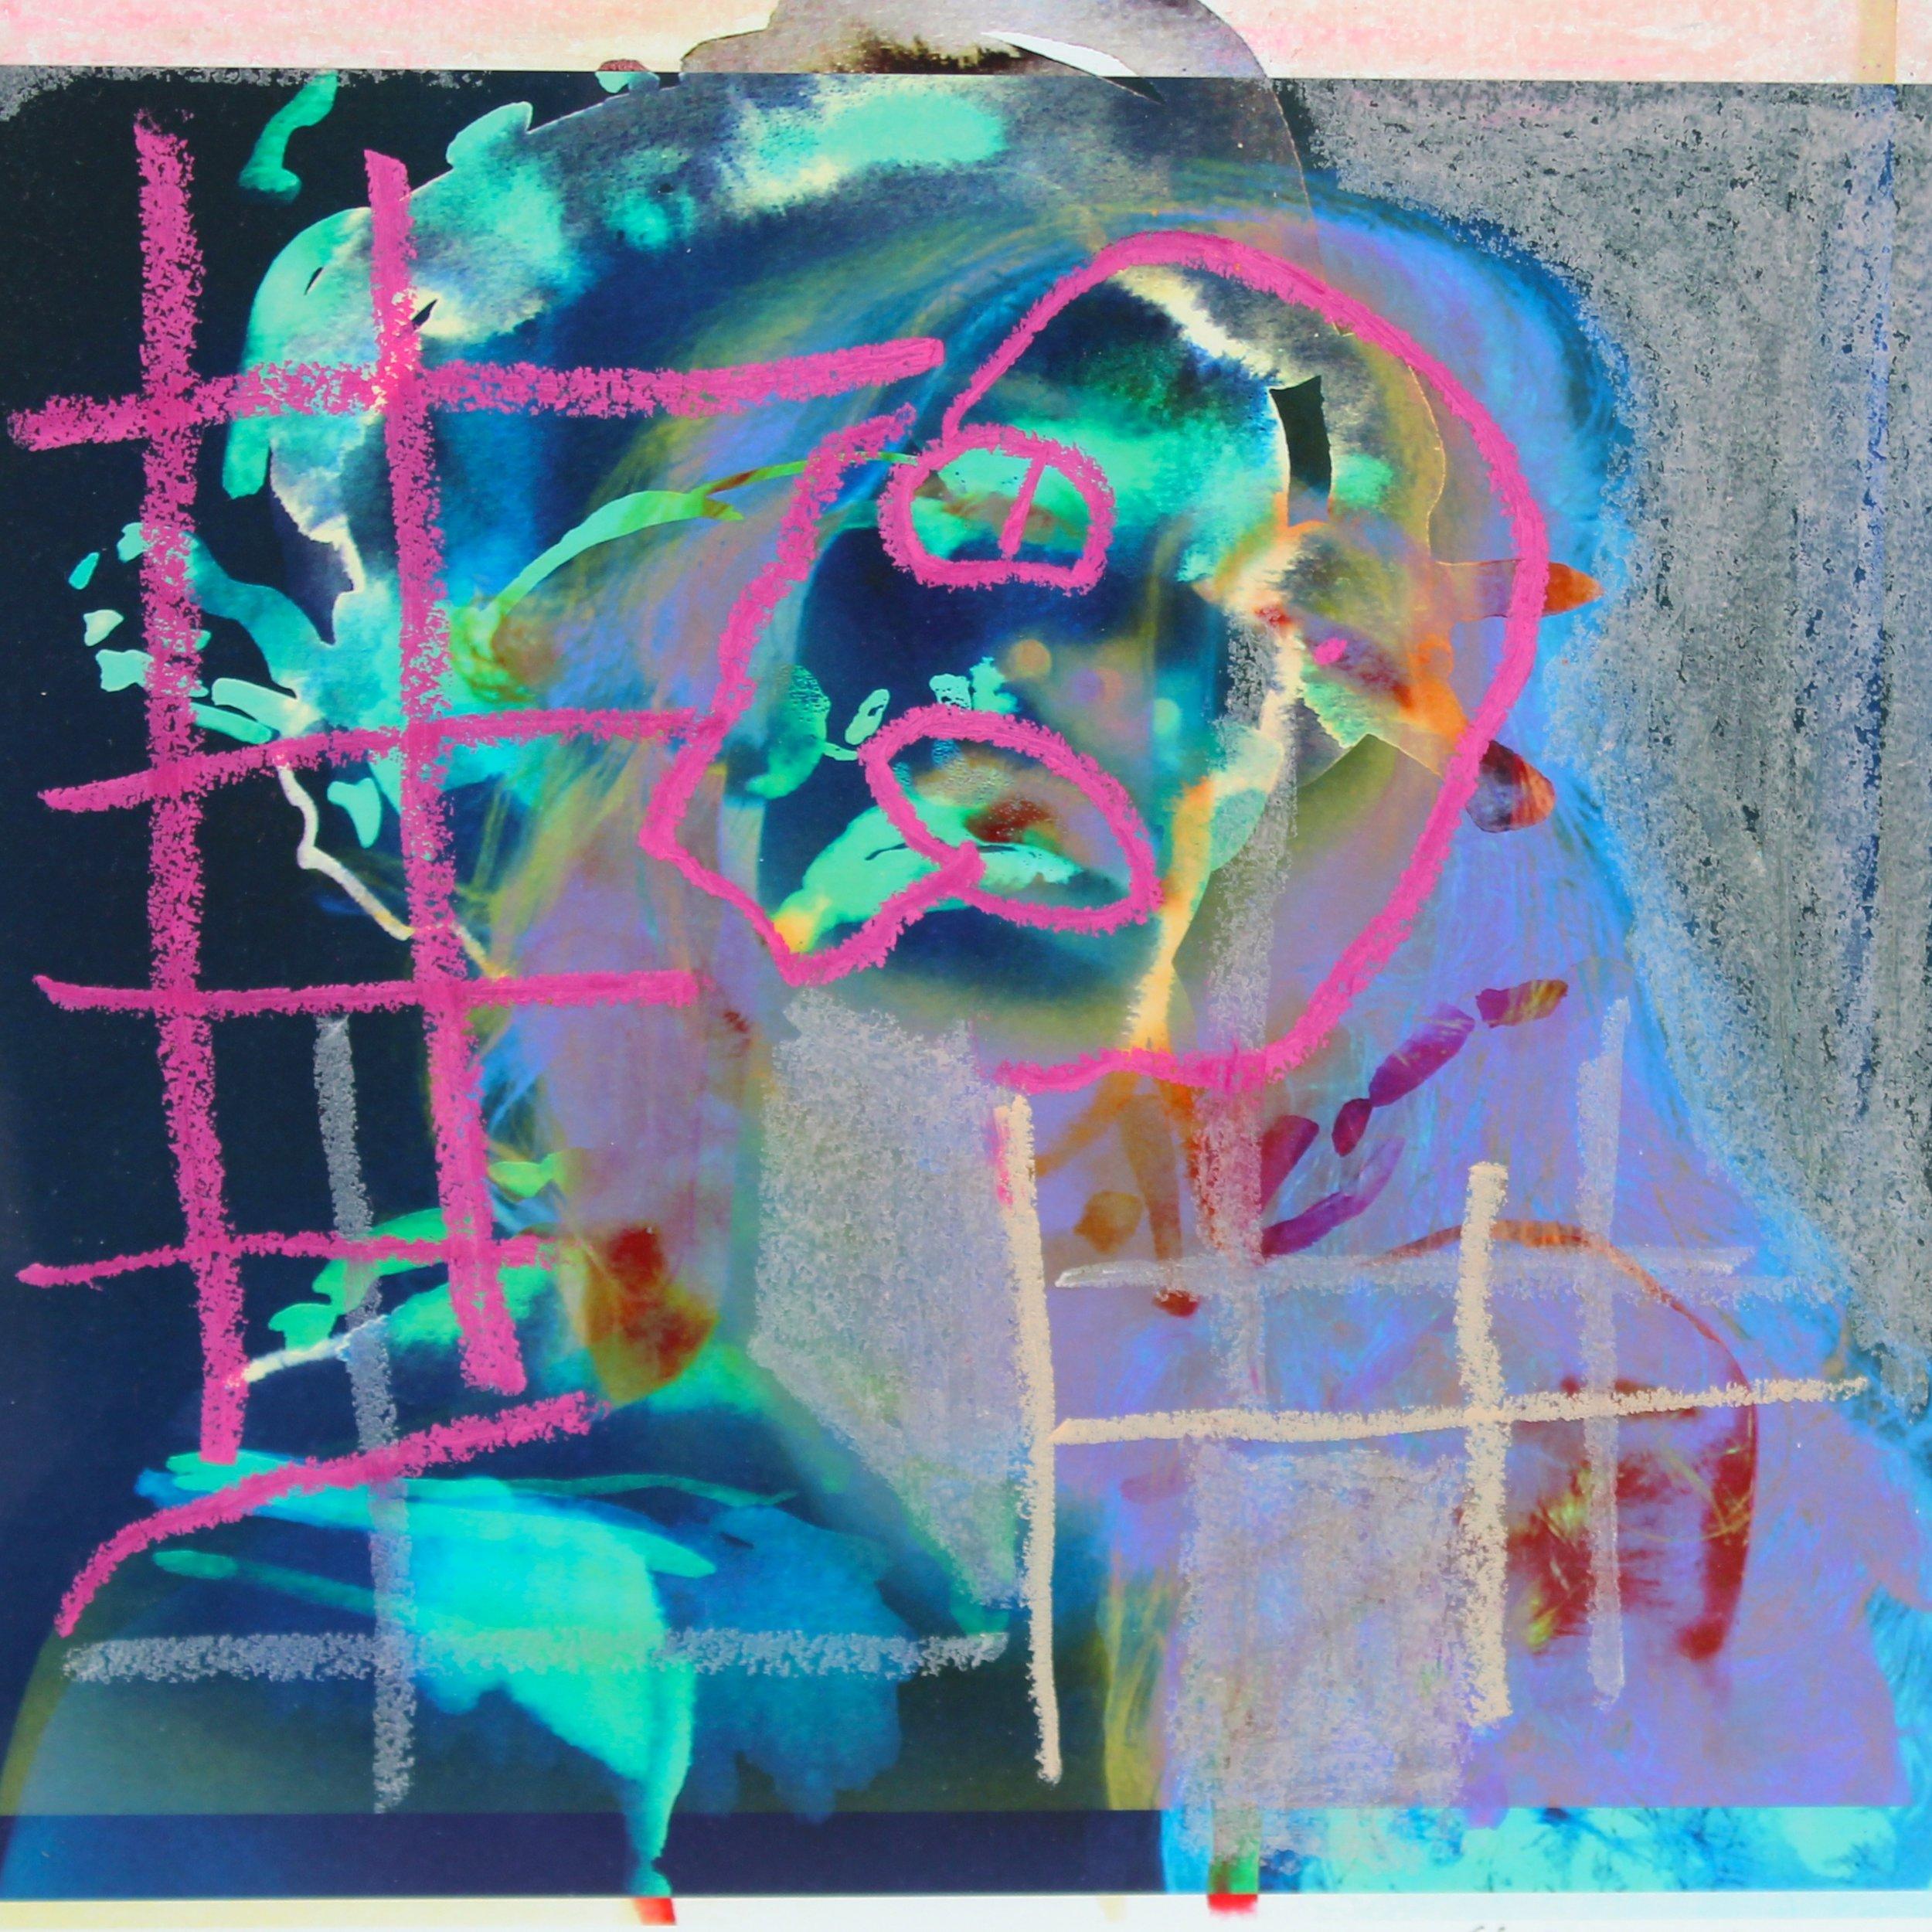 Selfie II  Oil pastel on Giclée print  42 cm x 42 cm  2016  Sold